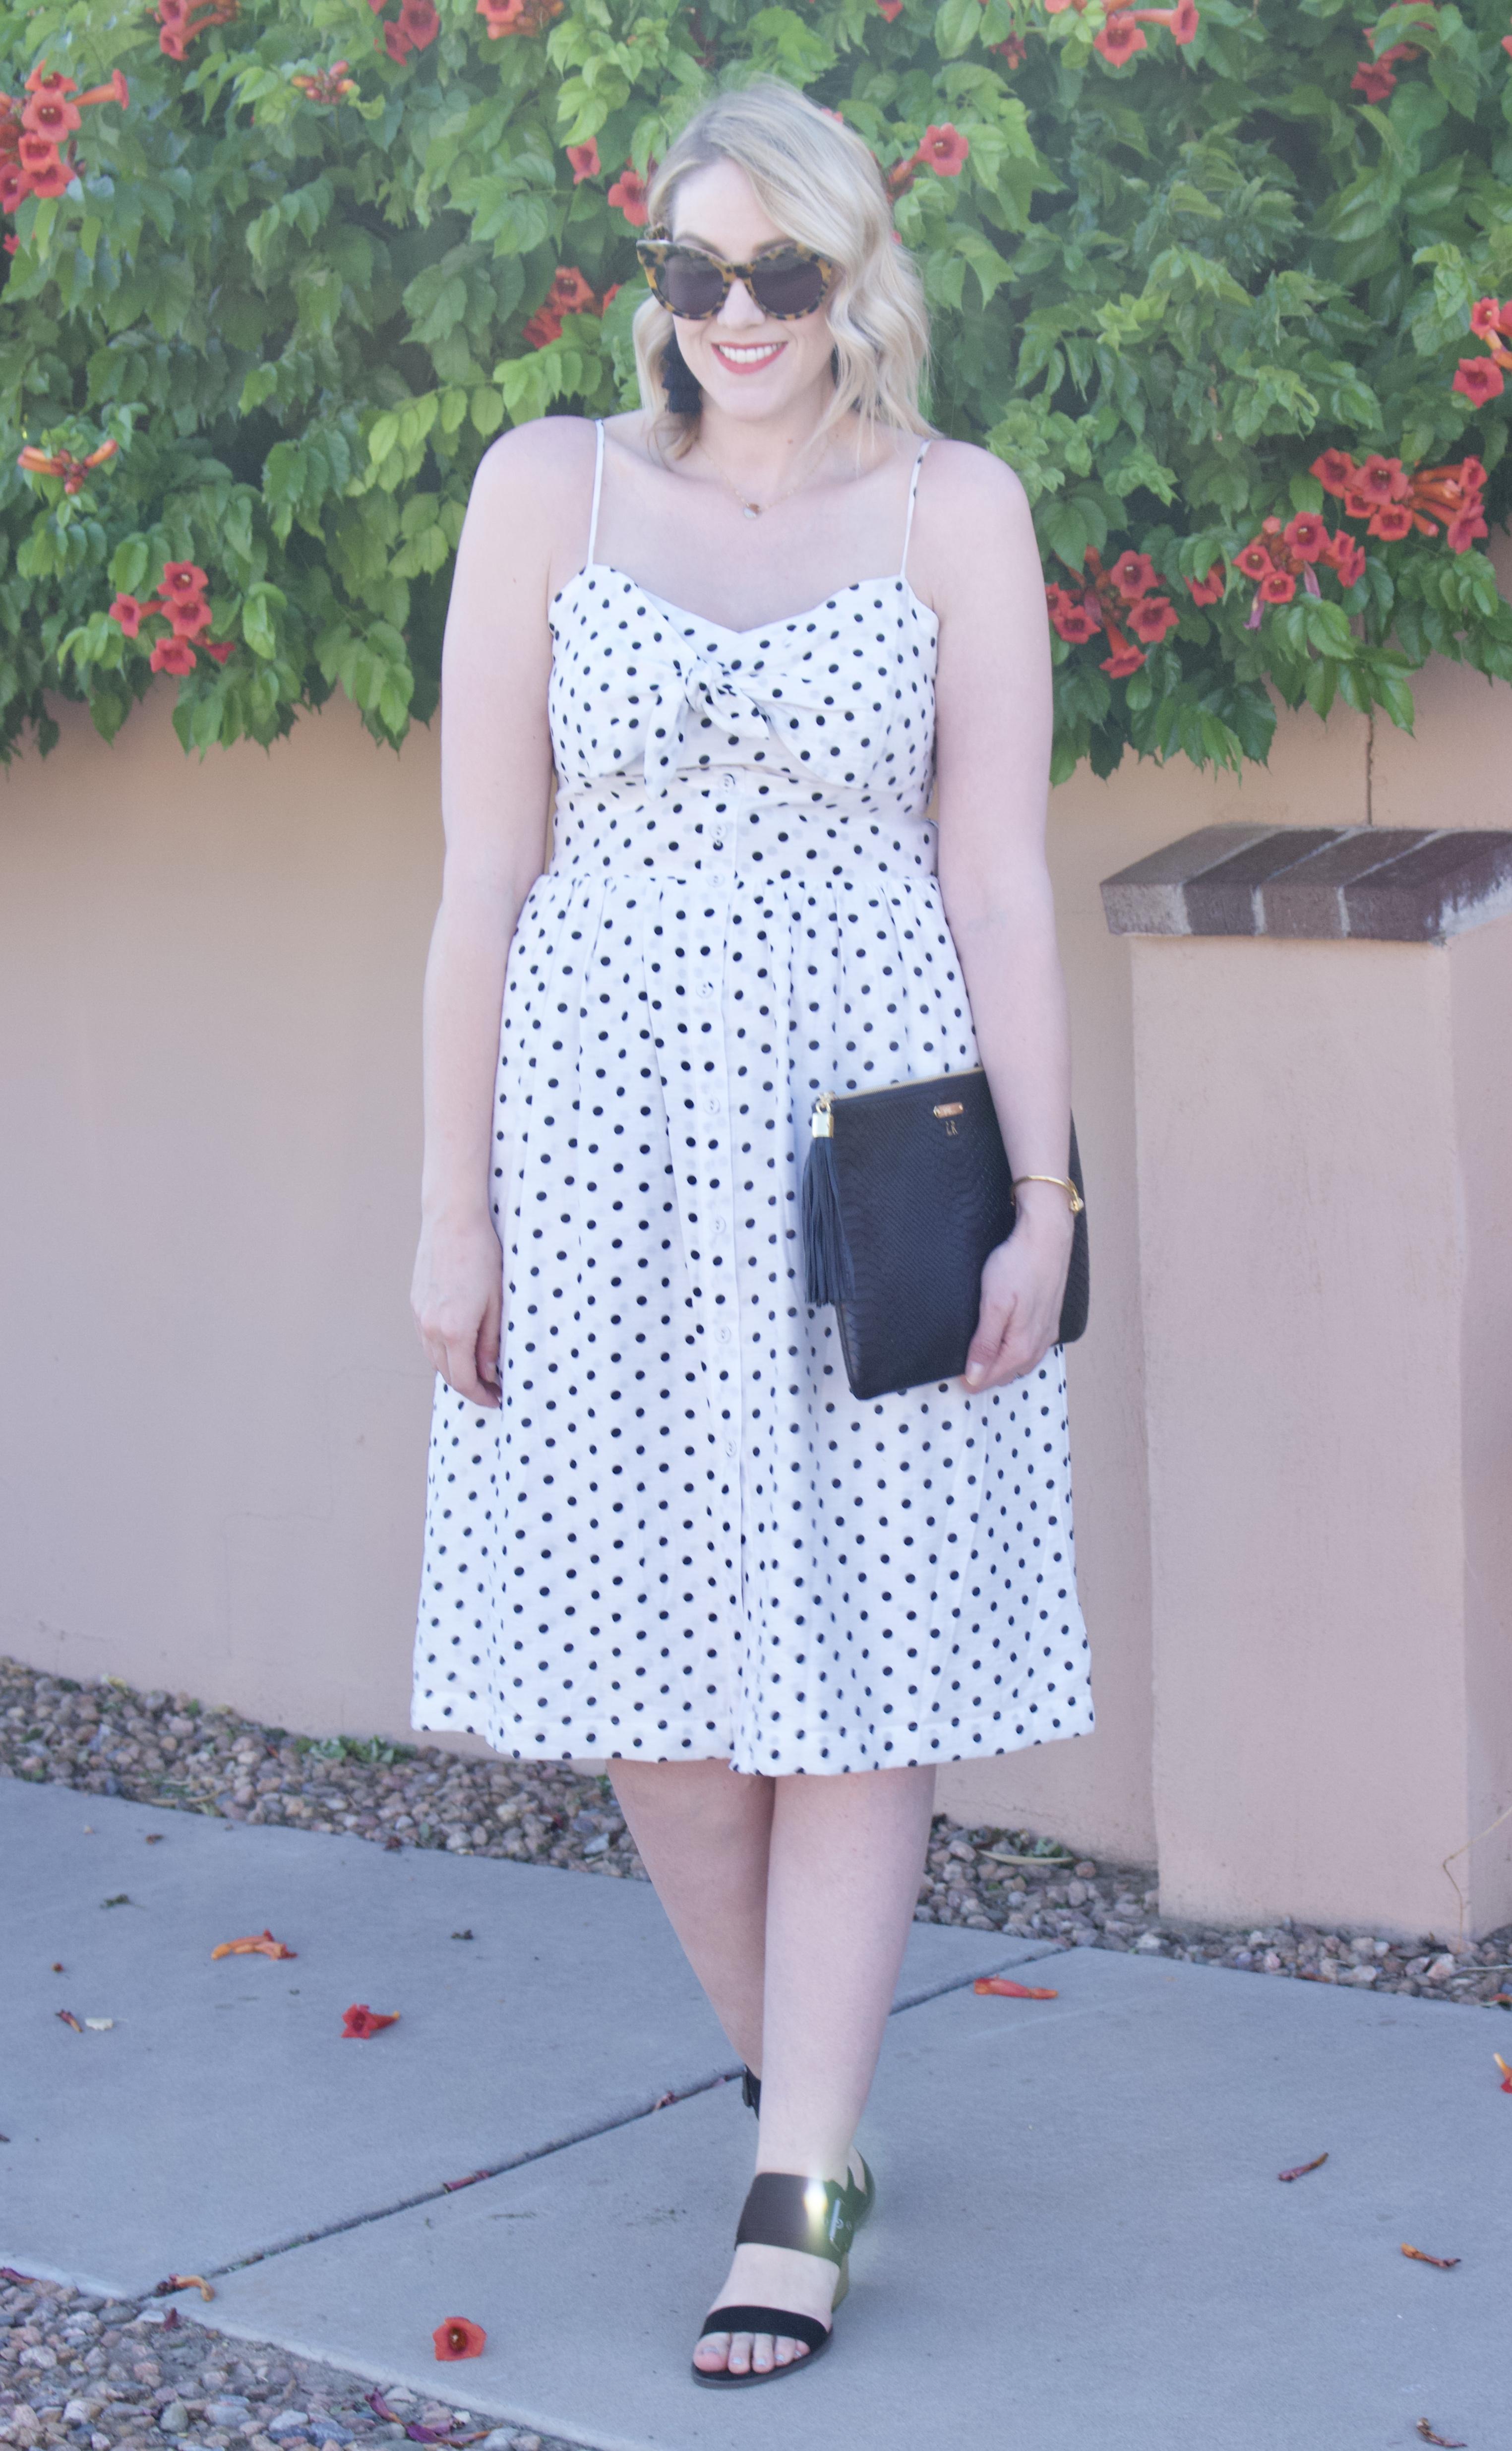 white polka dot midi dress target style #targetstyle #mididress #summerstyle